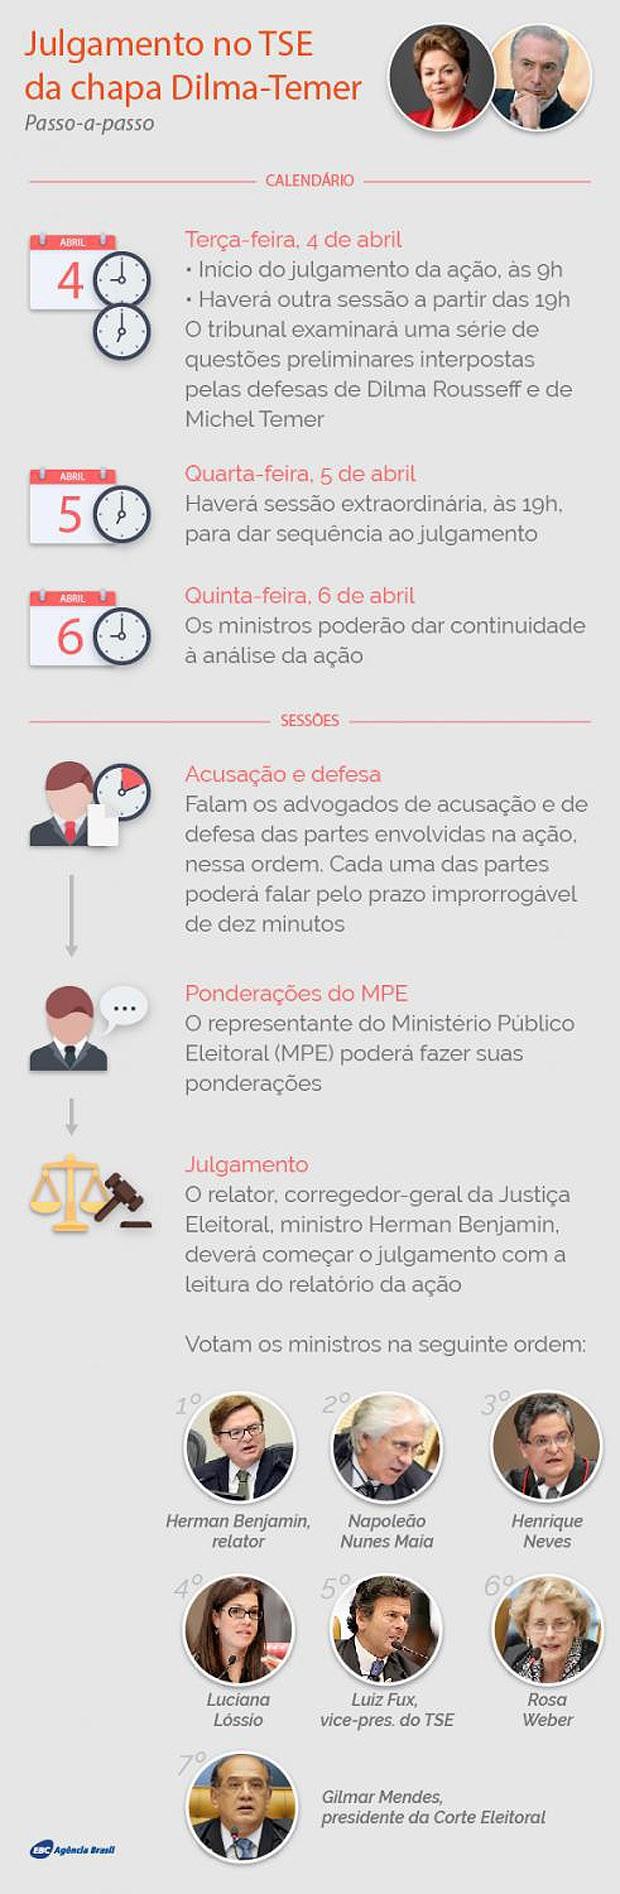 Tabela julgamento TSE (Foto: Reprodução/Agência Brasil)